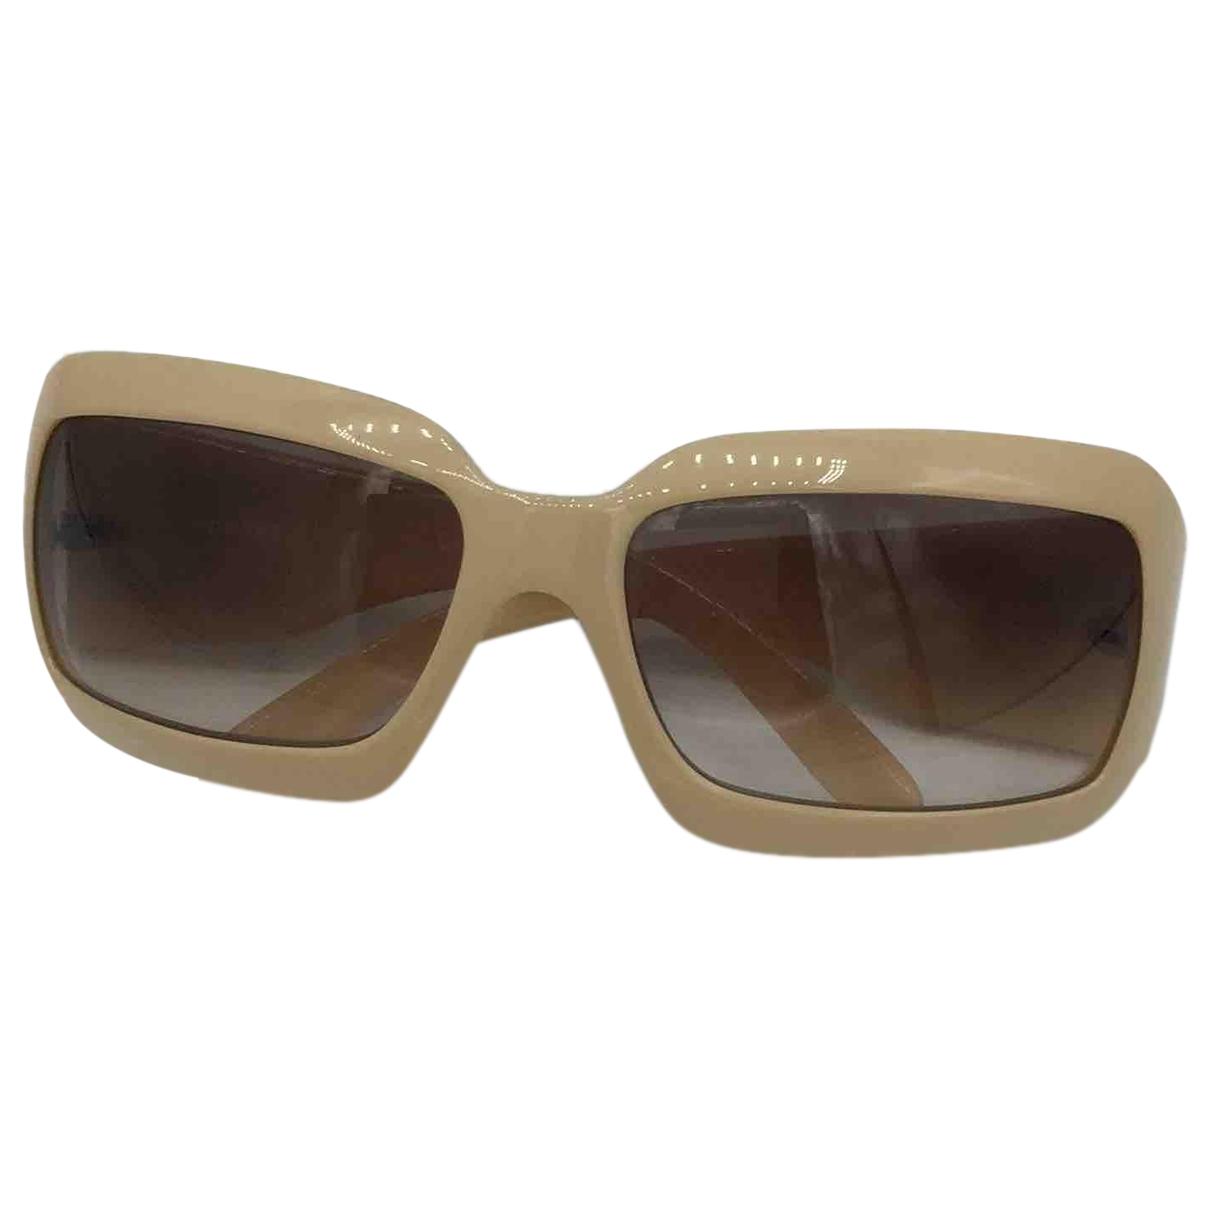 Chanel \N Beige Sunglasses for Women \N